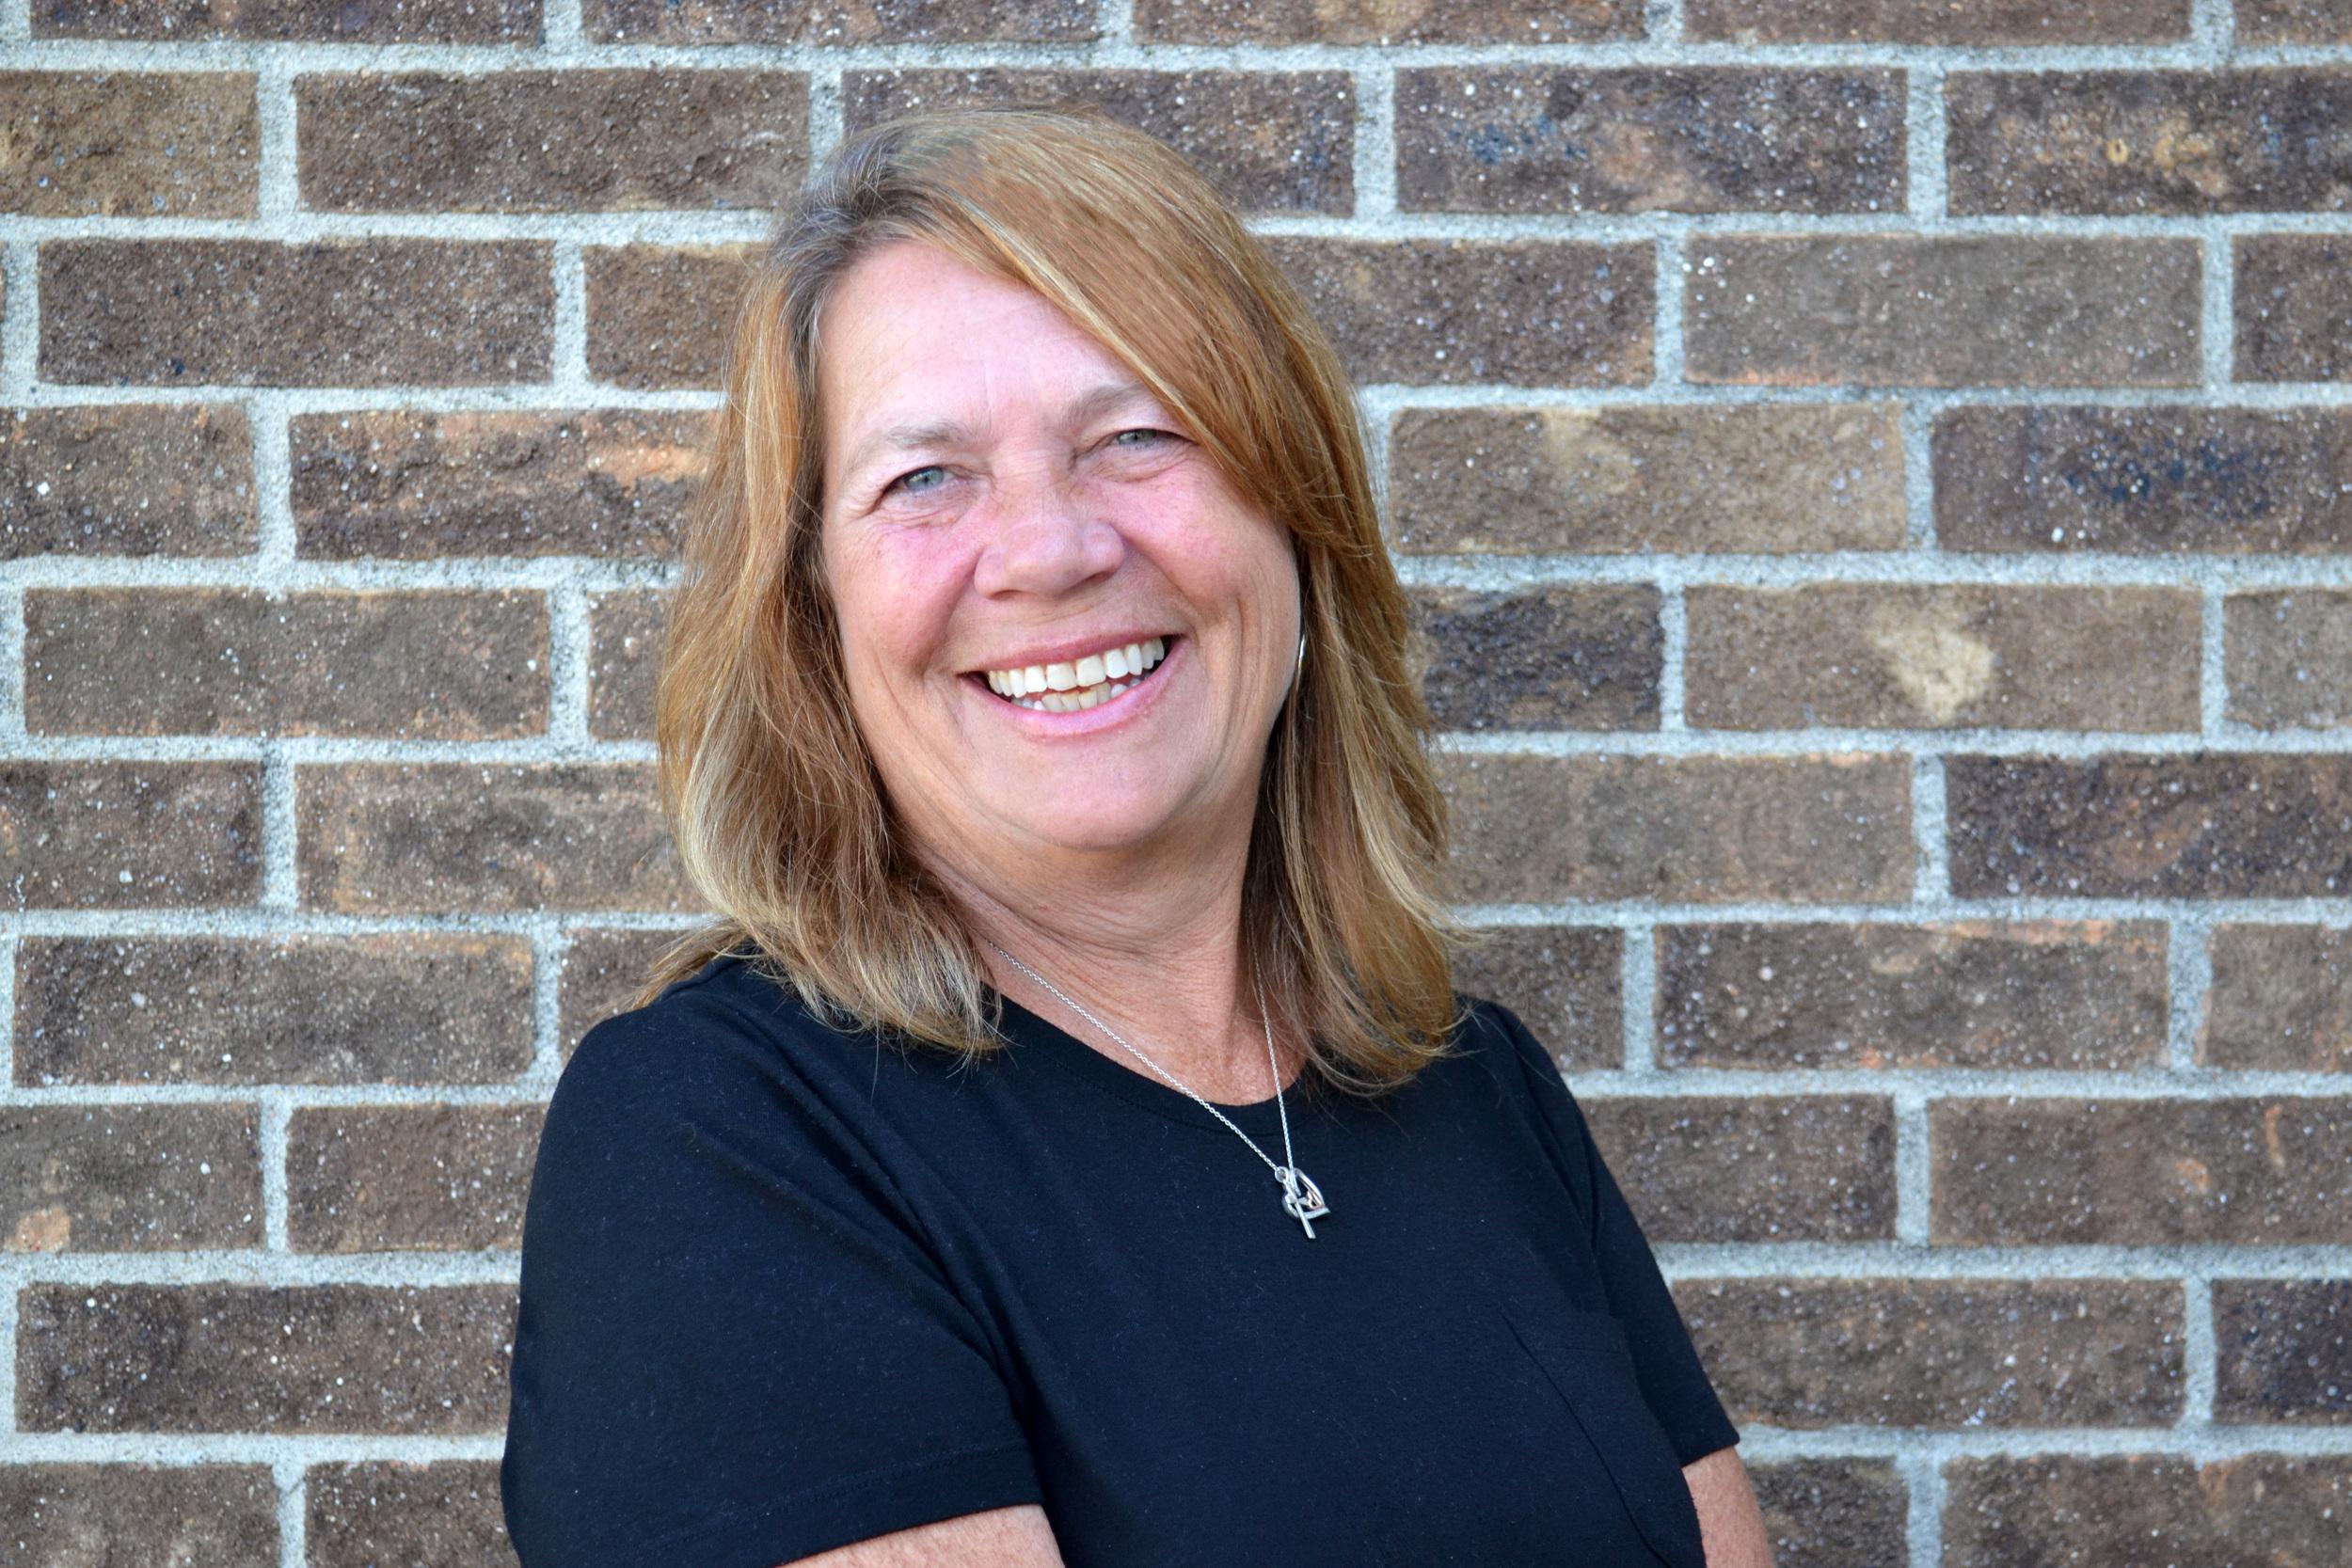 Kathy Crosbie , Dir. of Homeowner Services (740) 363-9950 x2003  kcrosbie@habitatdelawareunion.org